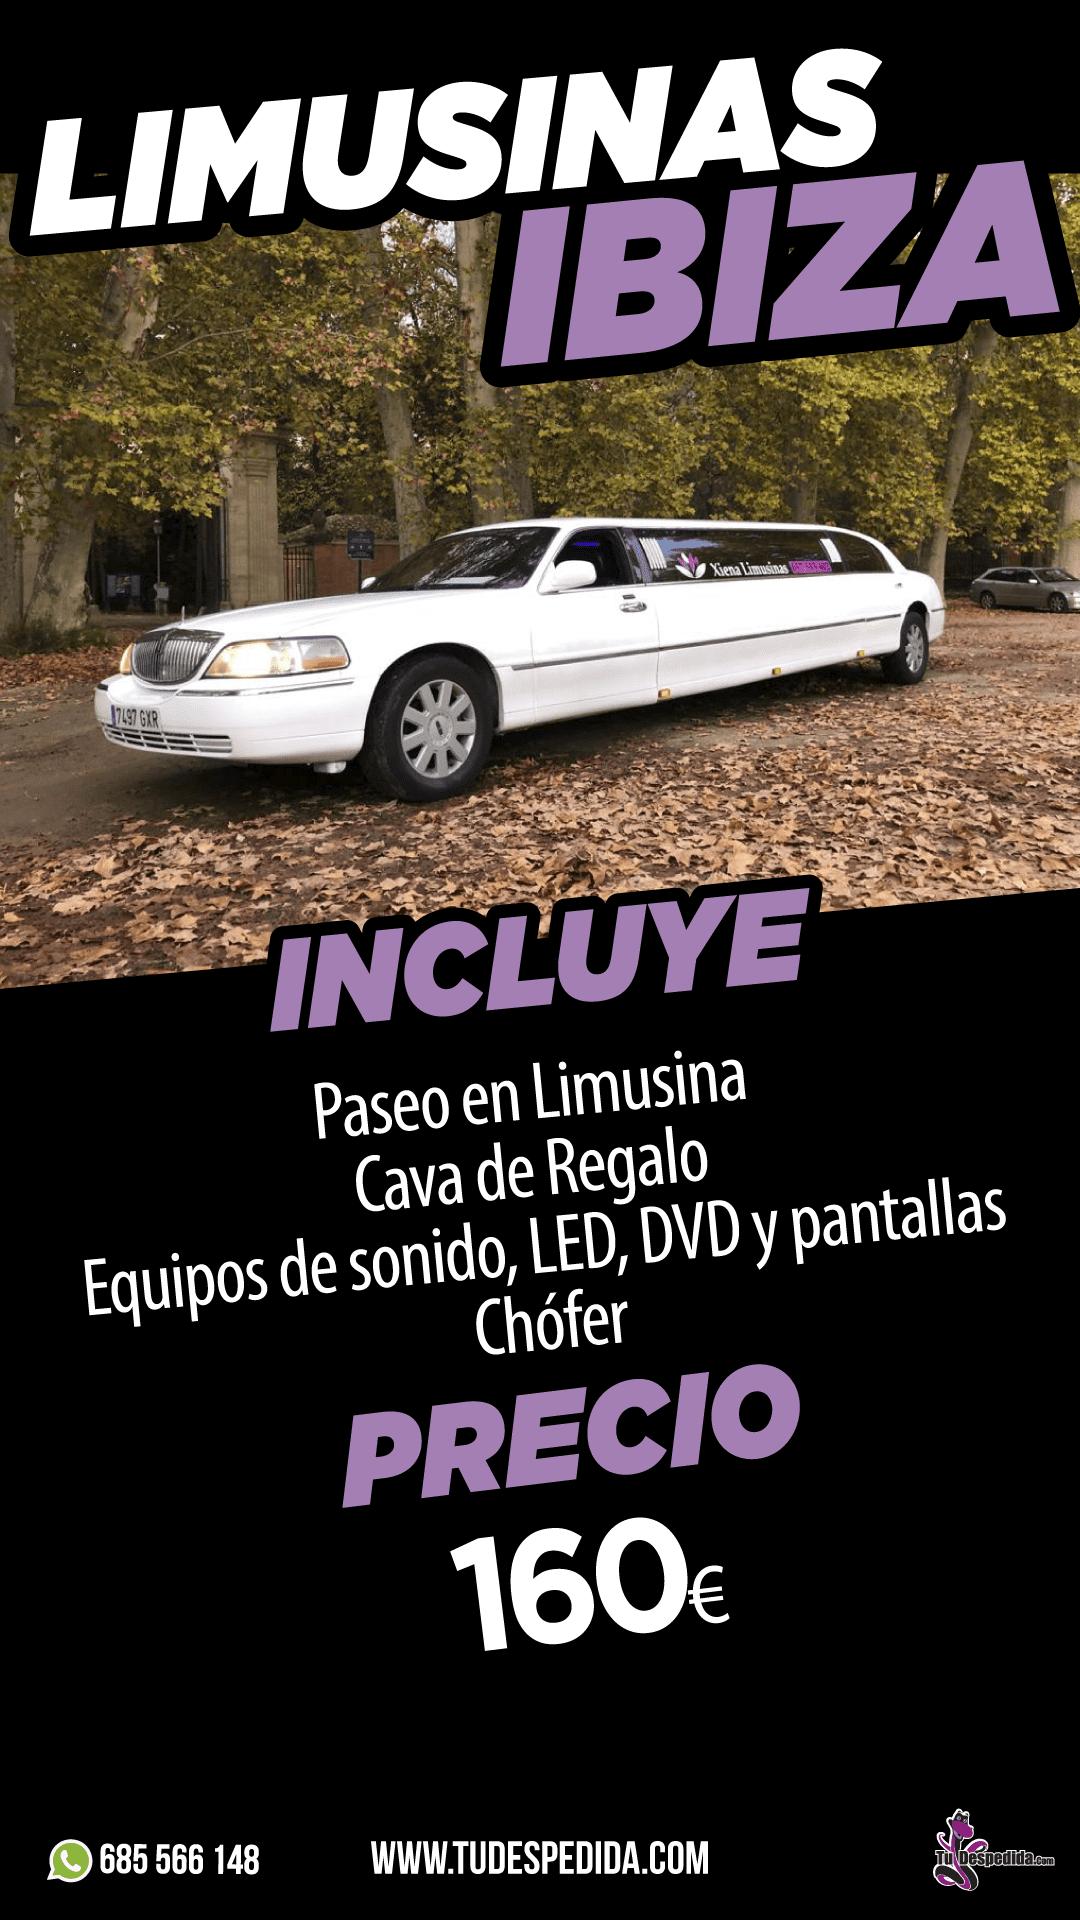 LIMUSINAS IBIZA